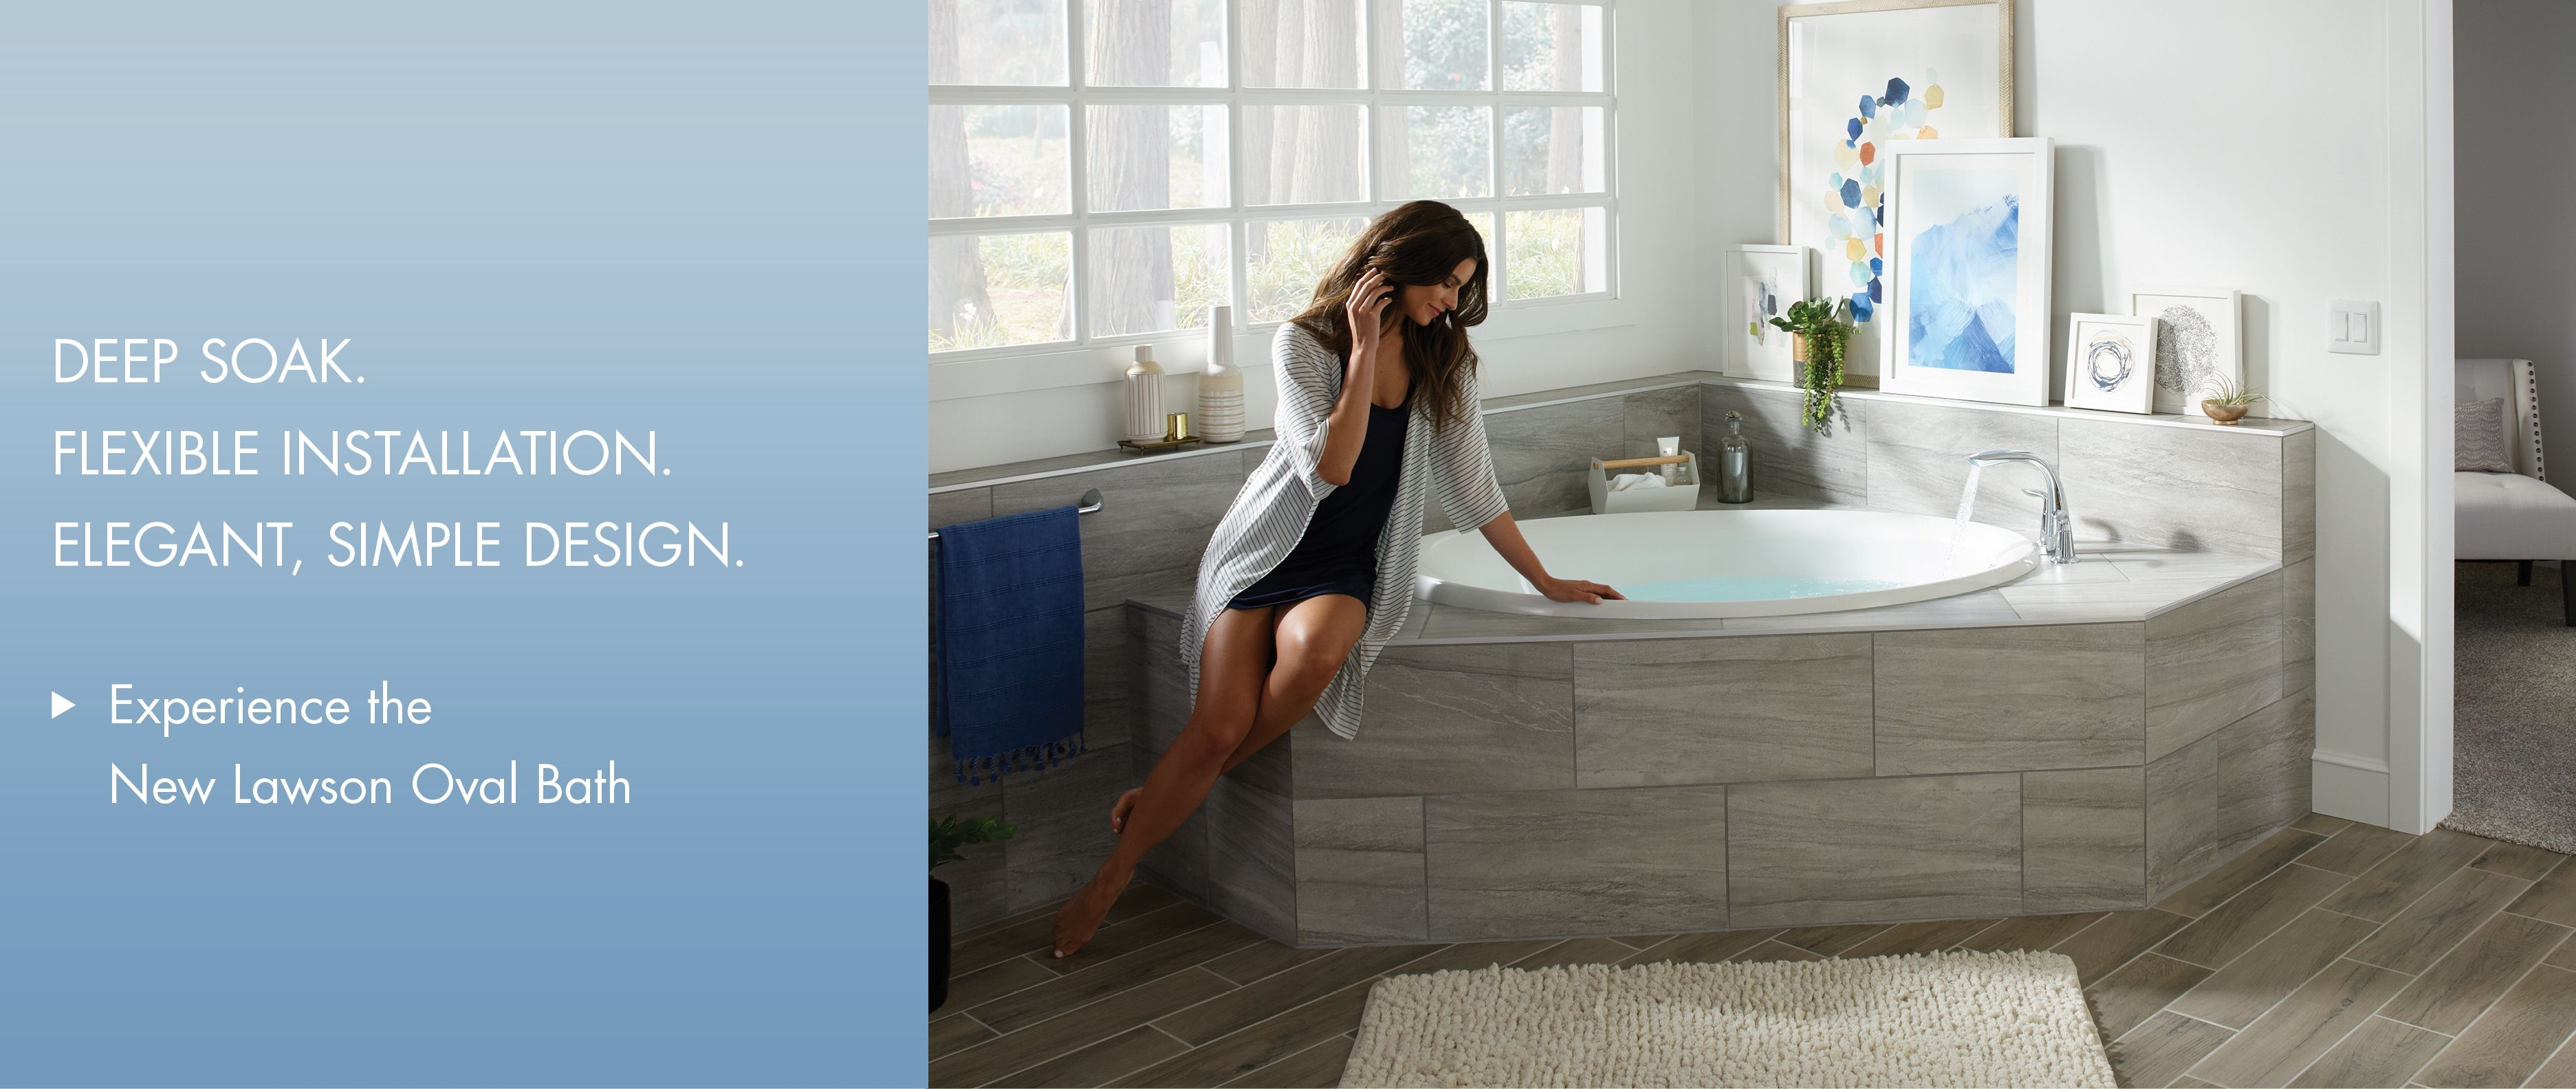 Magnificent Sterling Bath Tubs Sketch - Bathtub Ideas - dilata.info